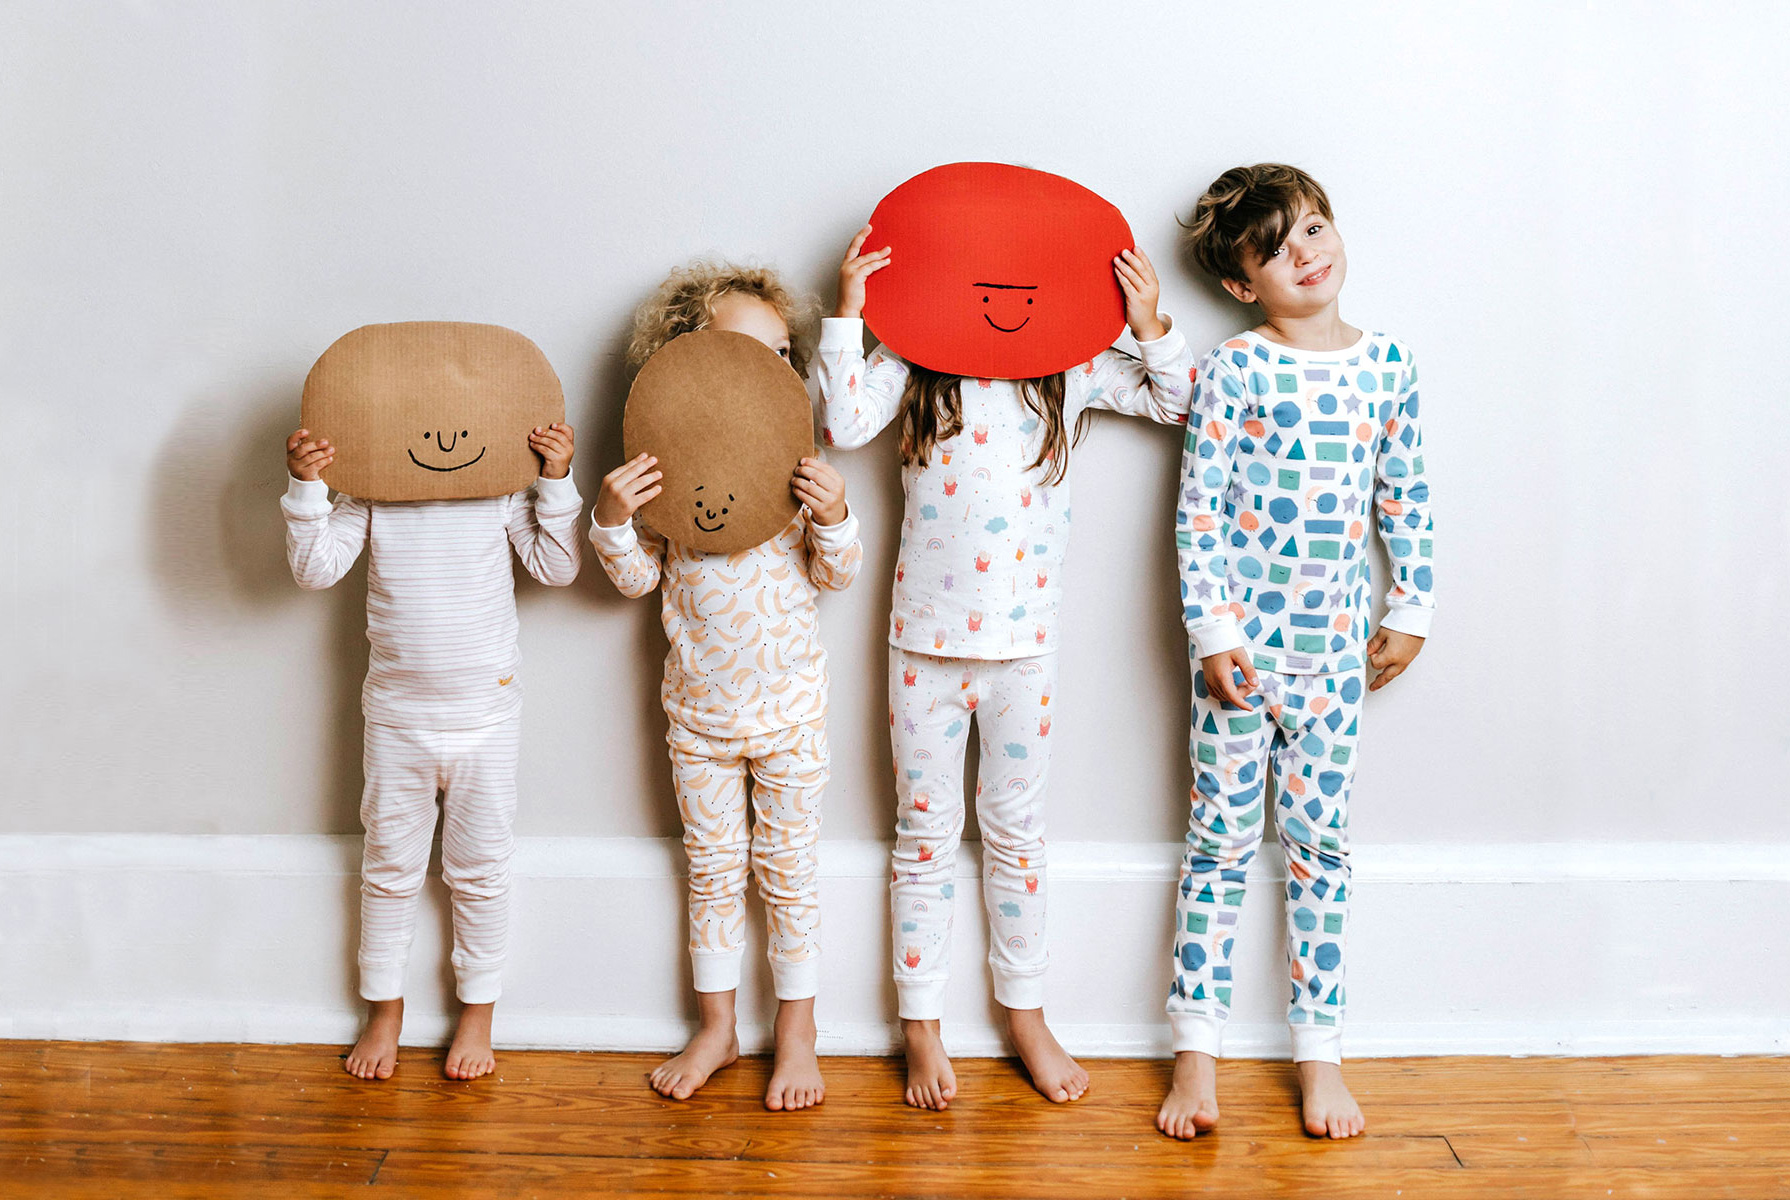 Alessandra Olanow's Illustrations Are Now Adorning Our Kids' Pyjamas